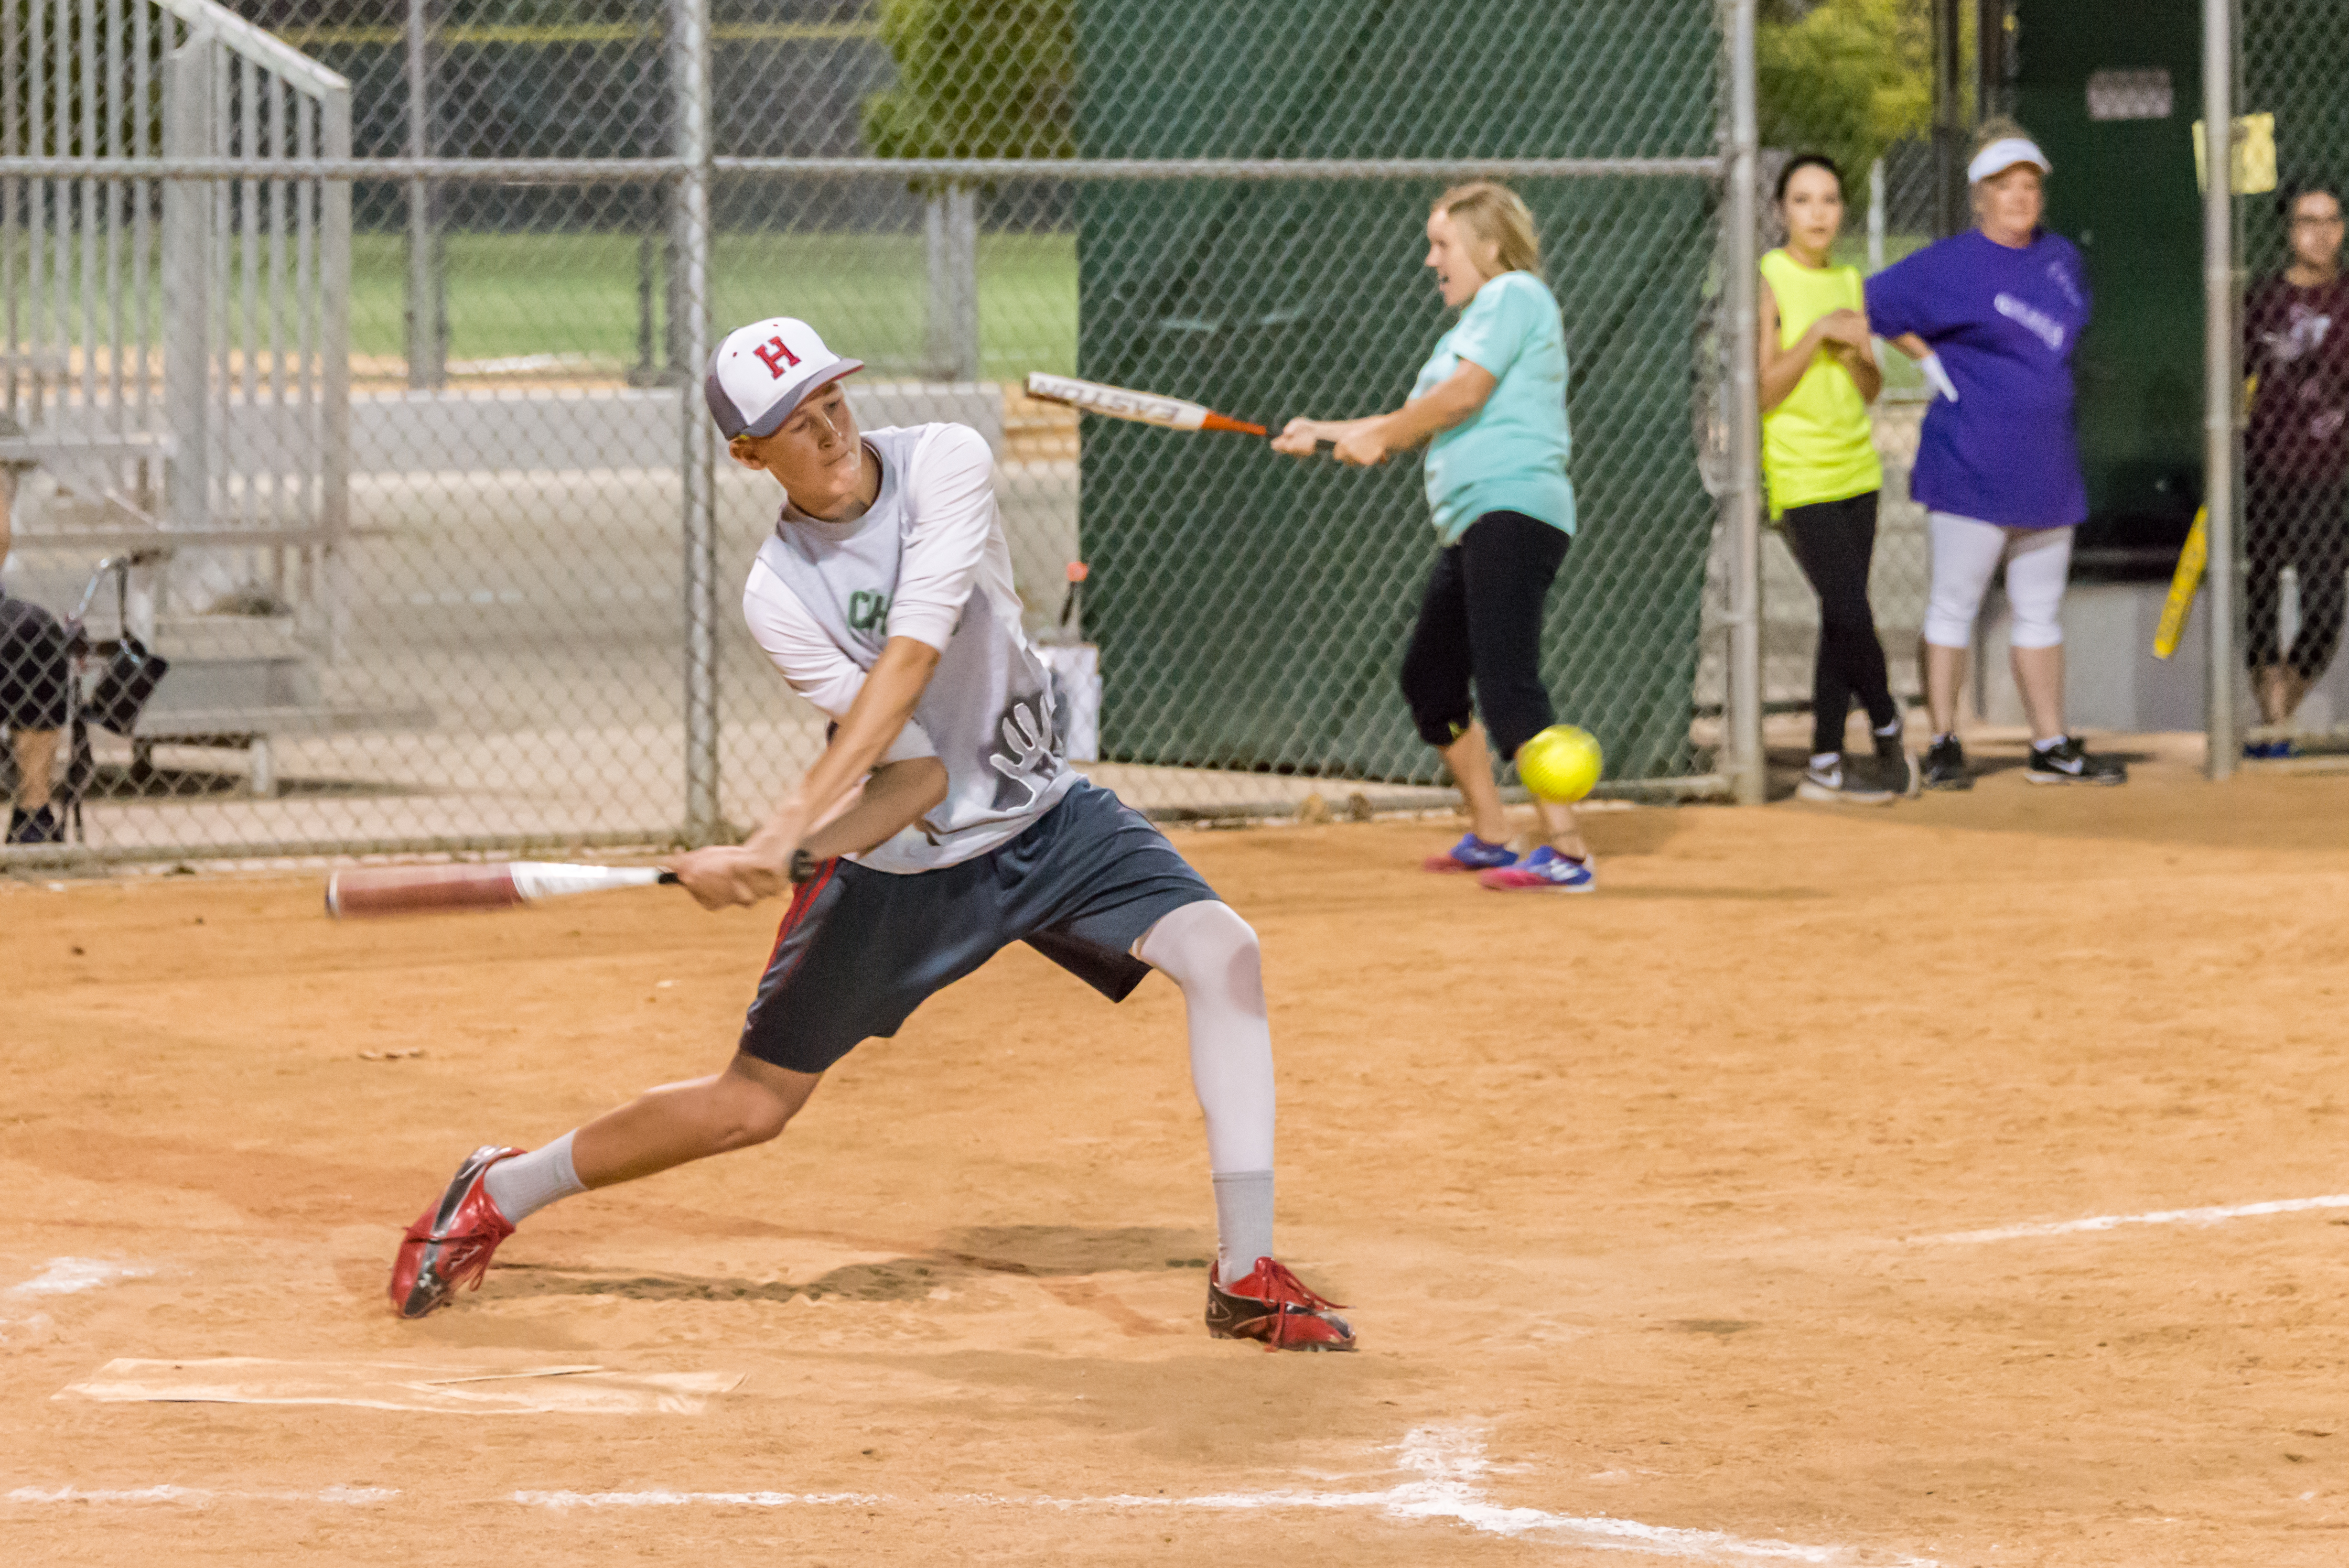 2015-06-11-baseballgame-037